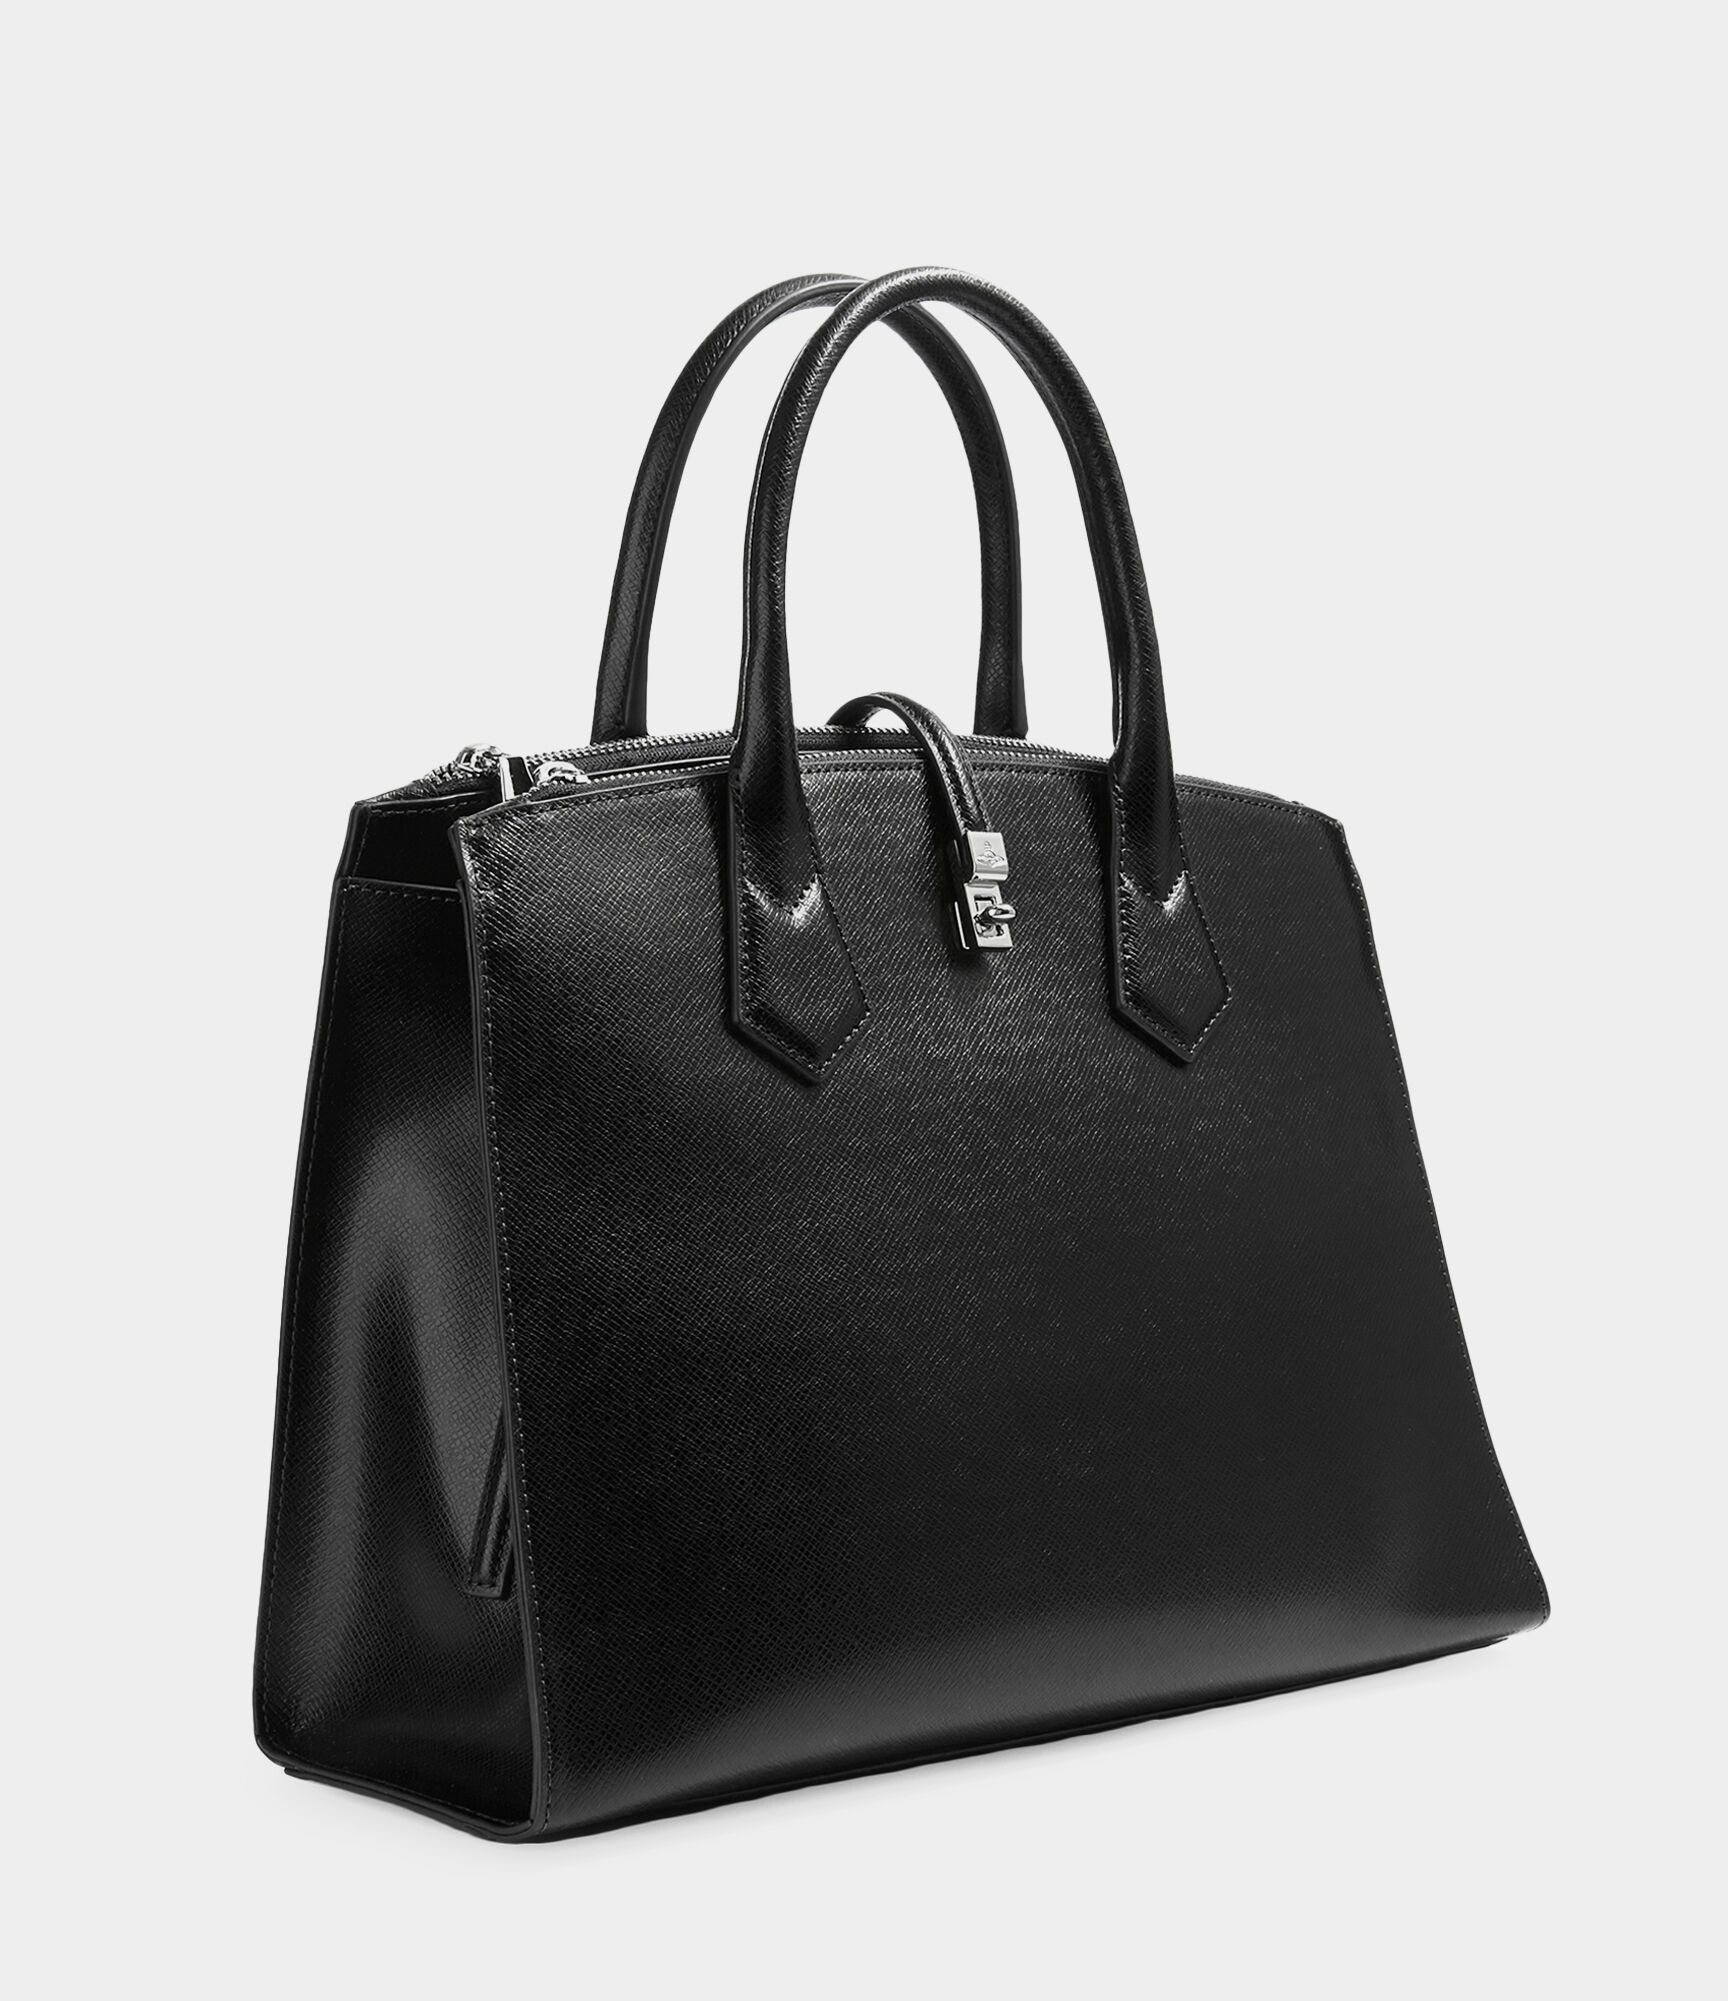 b15aabad27c VIVIENNE WESTWOOD SOFIA OFFICE BAG BLACK | ModeSens